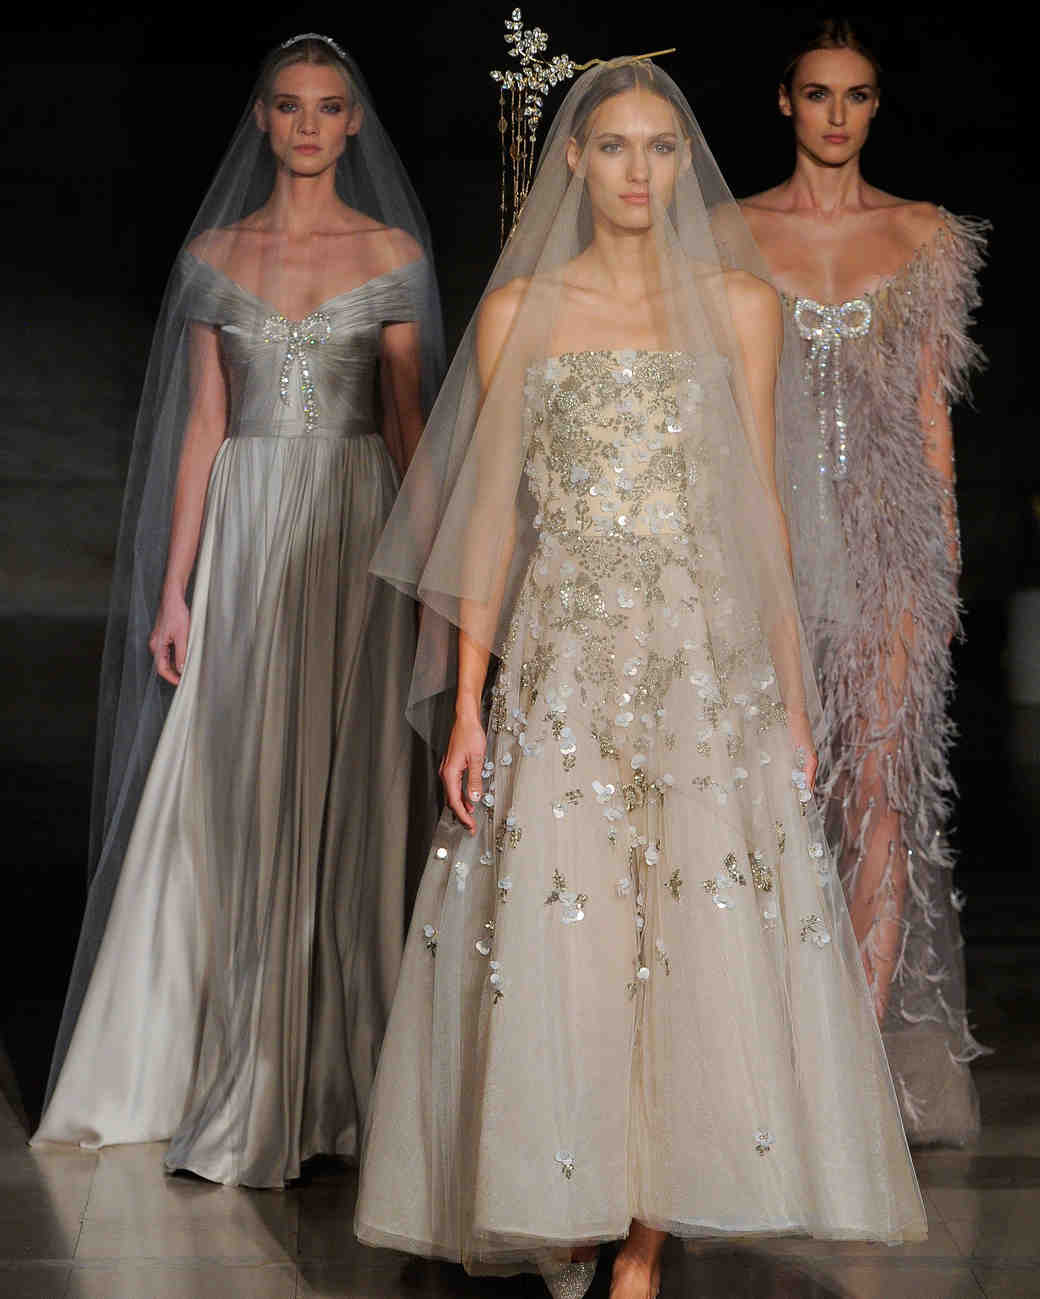 Reem Acra Wedding Dress: Reem Acra's New Wedding Dresses: The Celebration